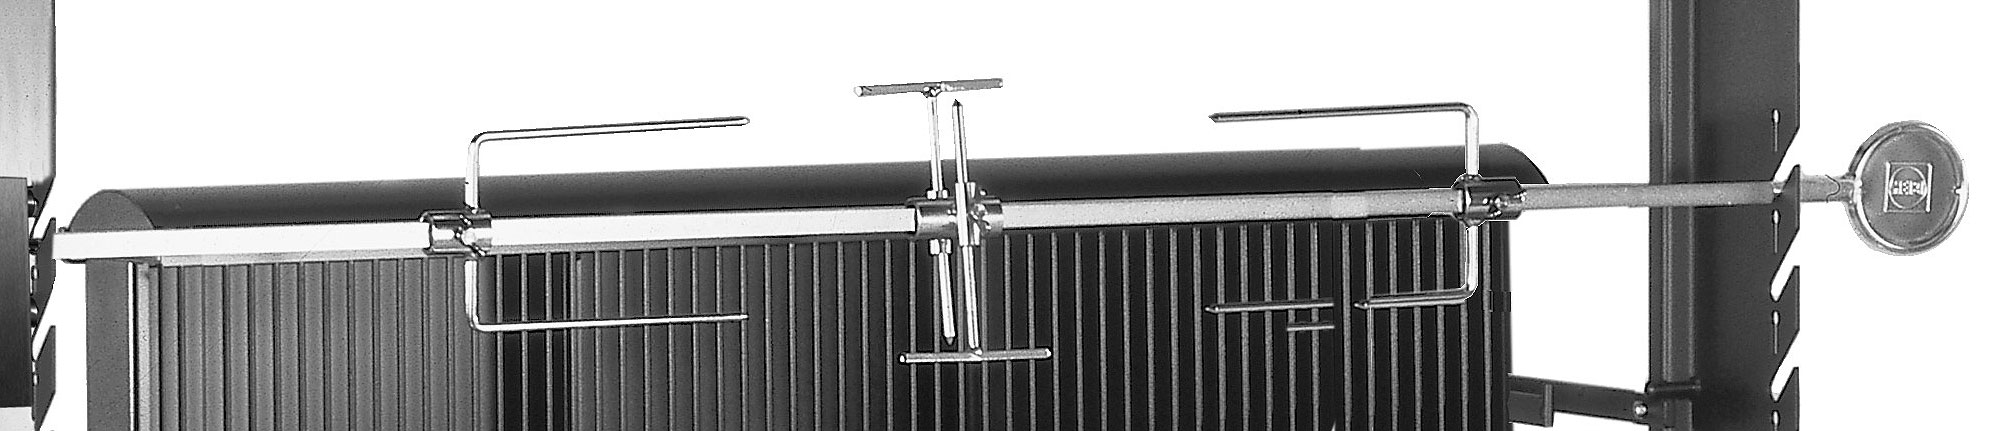 heibi grill profi 51213-028 +zubehör duo-gartengrill- art jardin